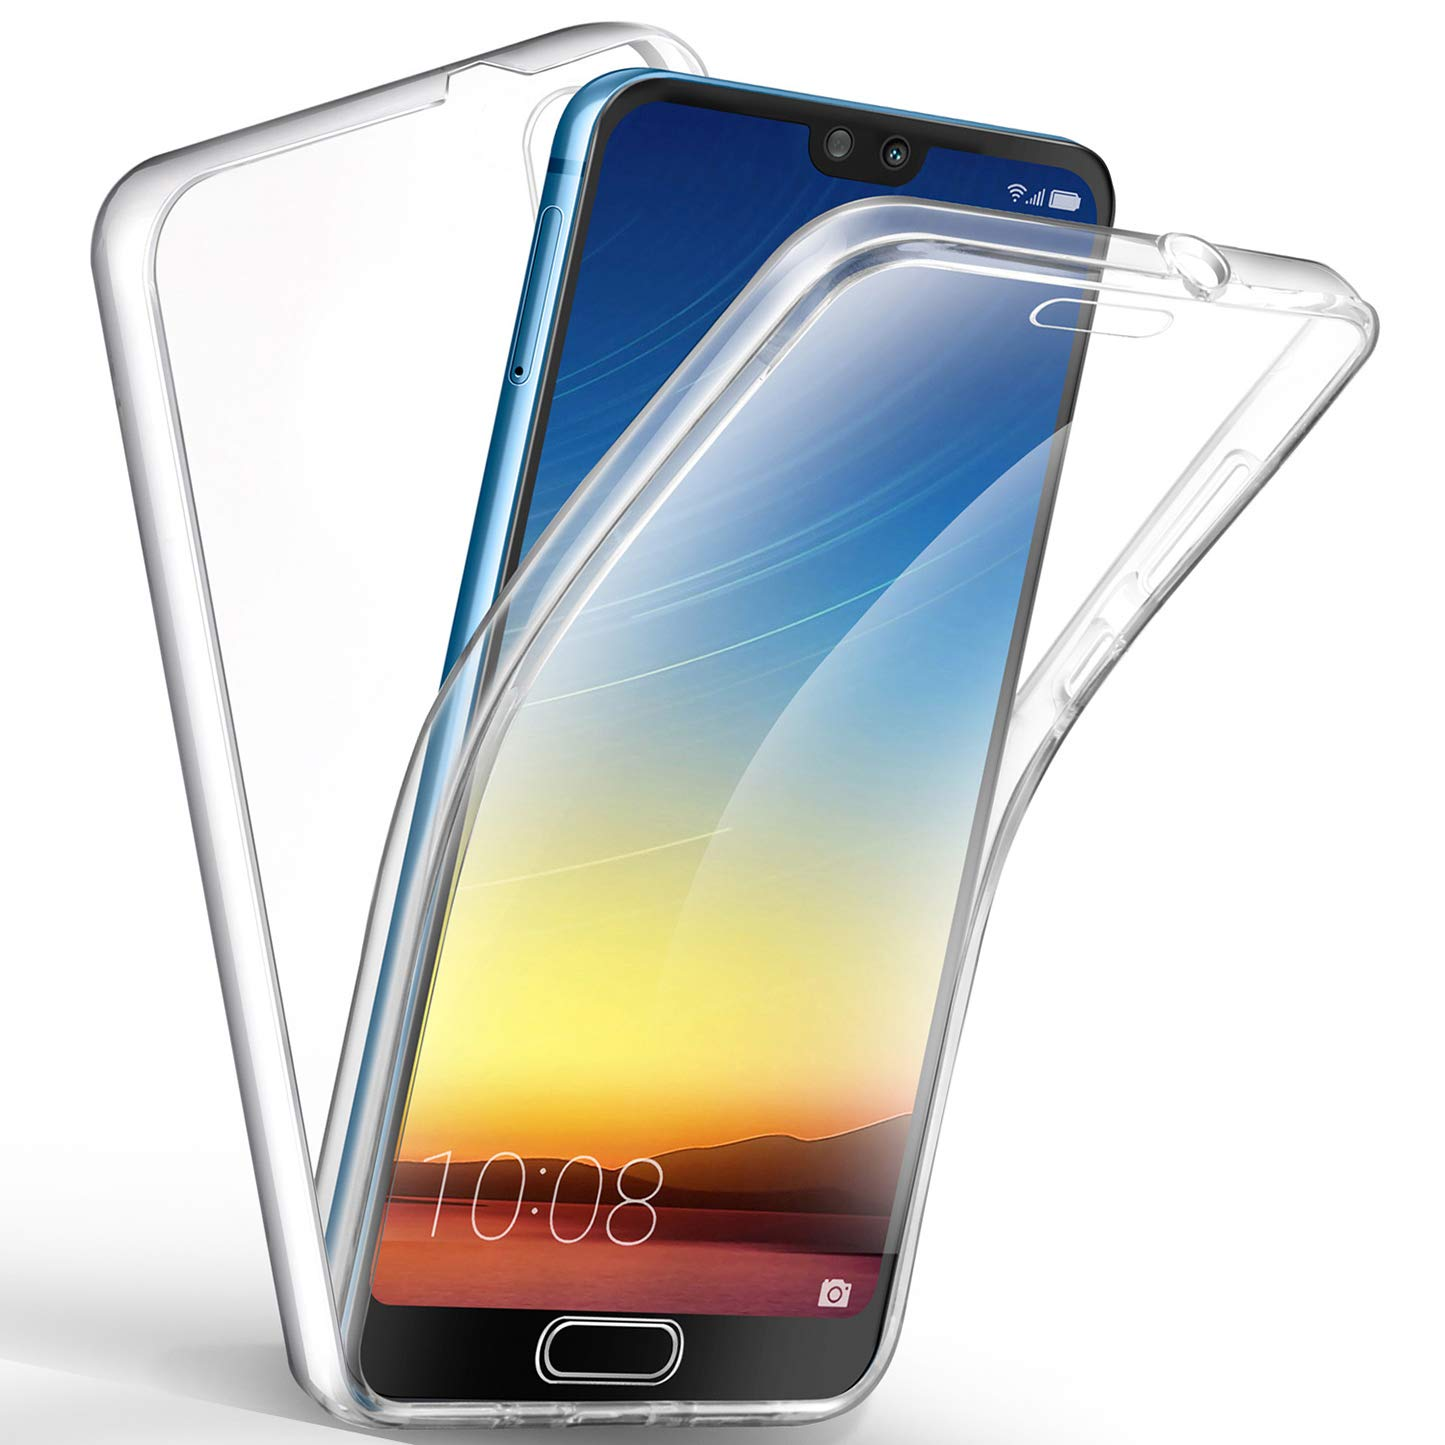 Sunwine Funda Huawei P20 Pro Carcasa, Transparente Ultra Fina Doble 360 Grados Full Cover Integral de Silicona TPU Delantera + Trasera rigido PC Funda ...